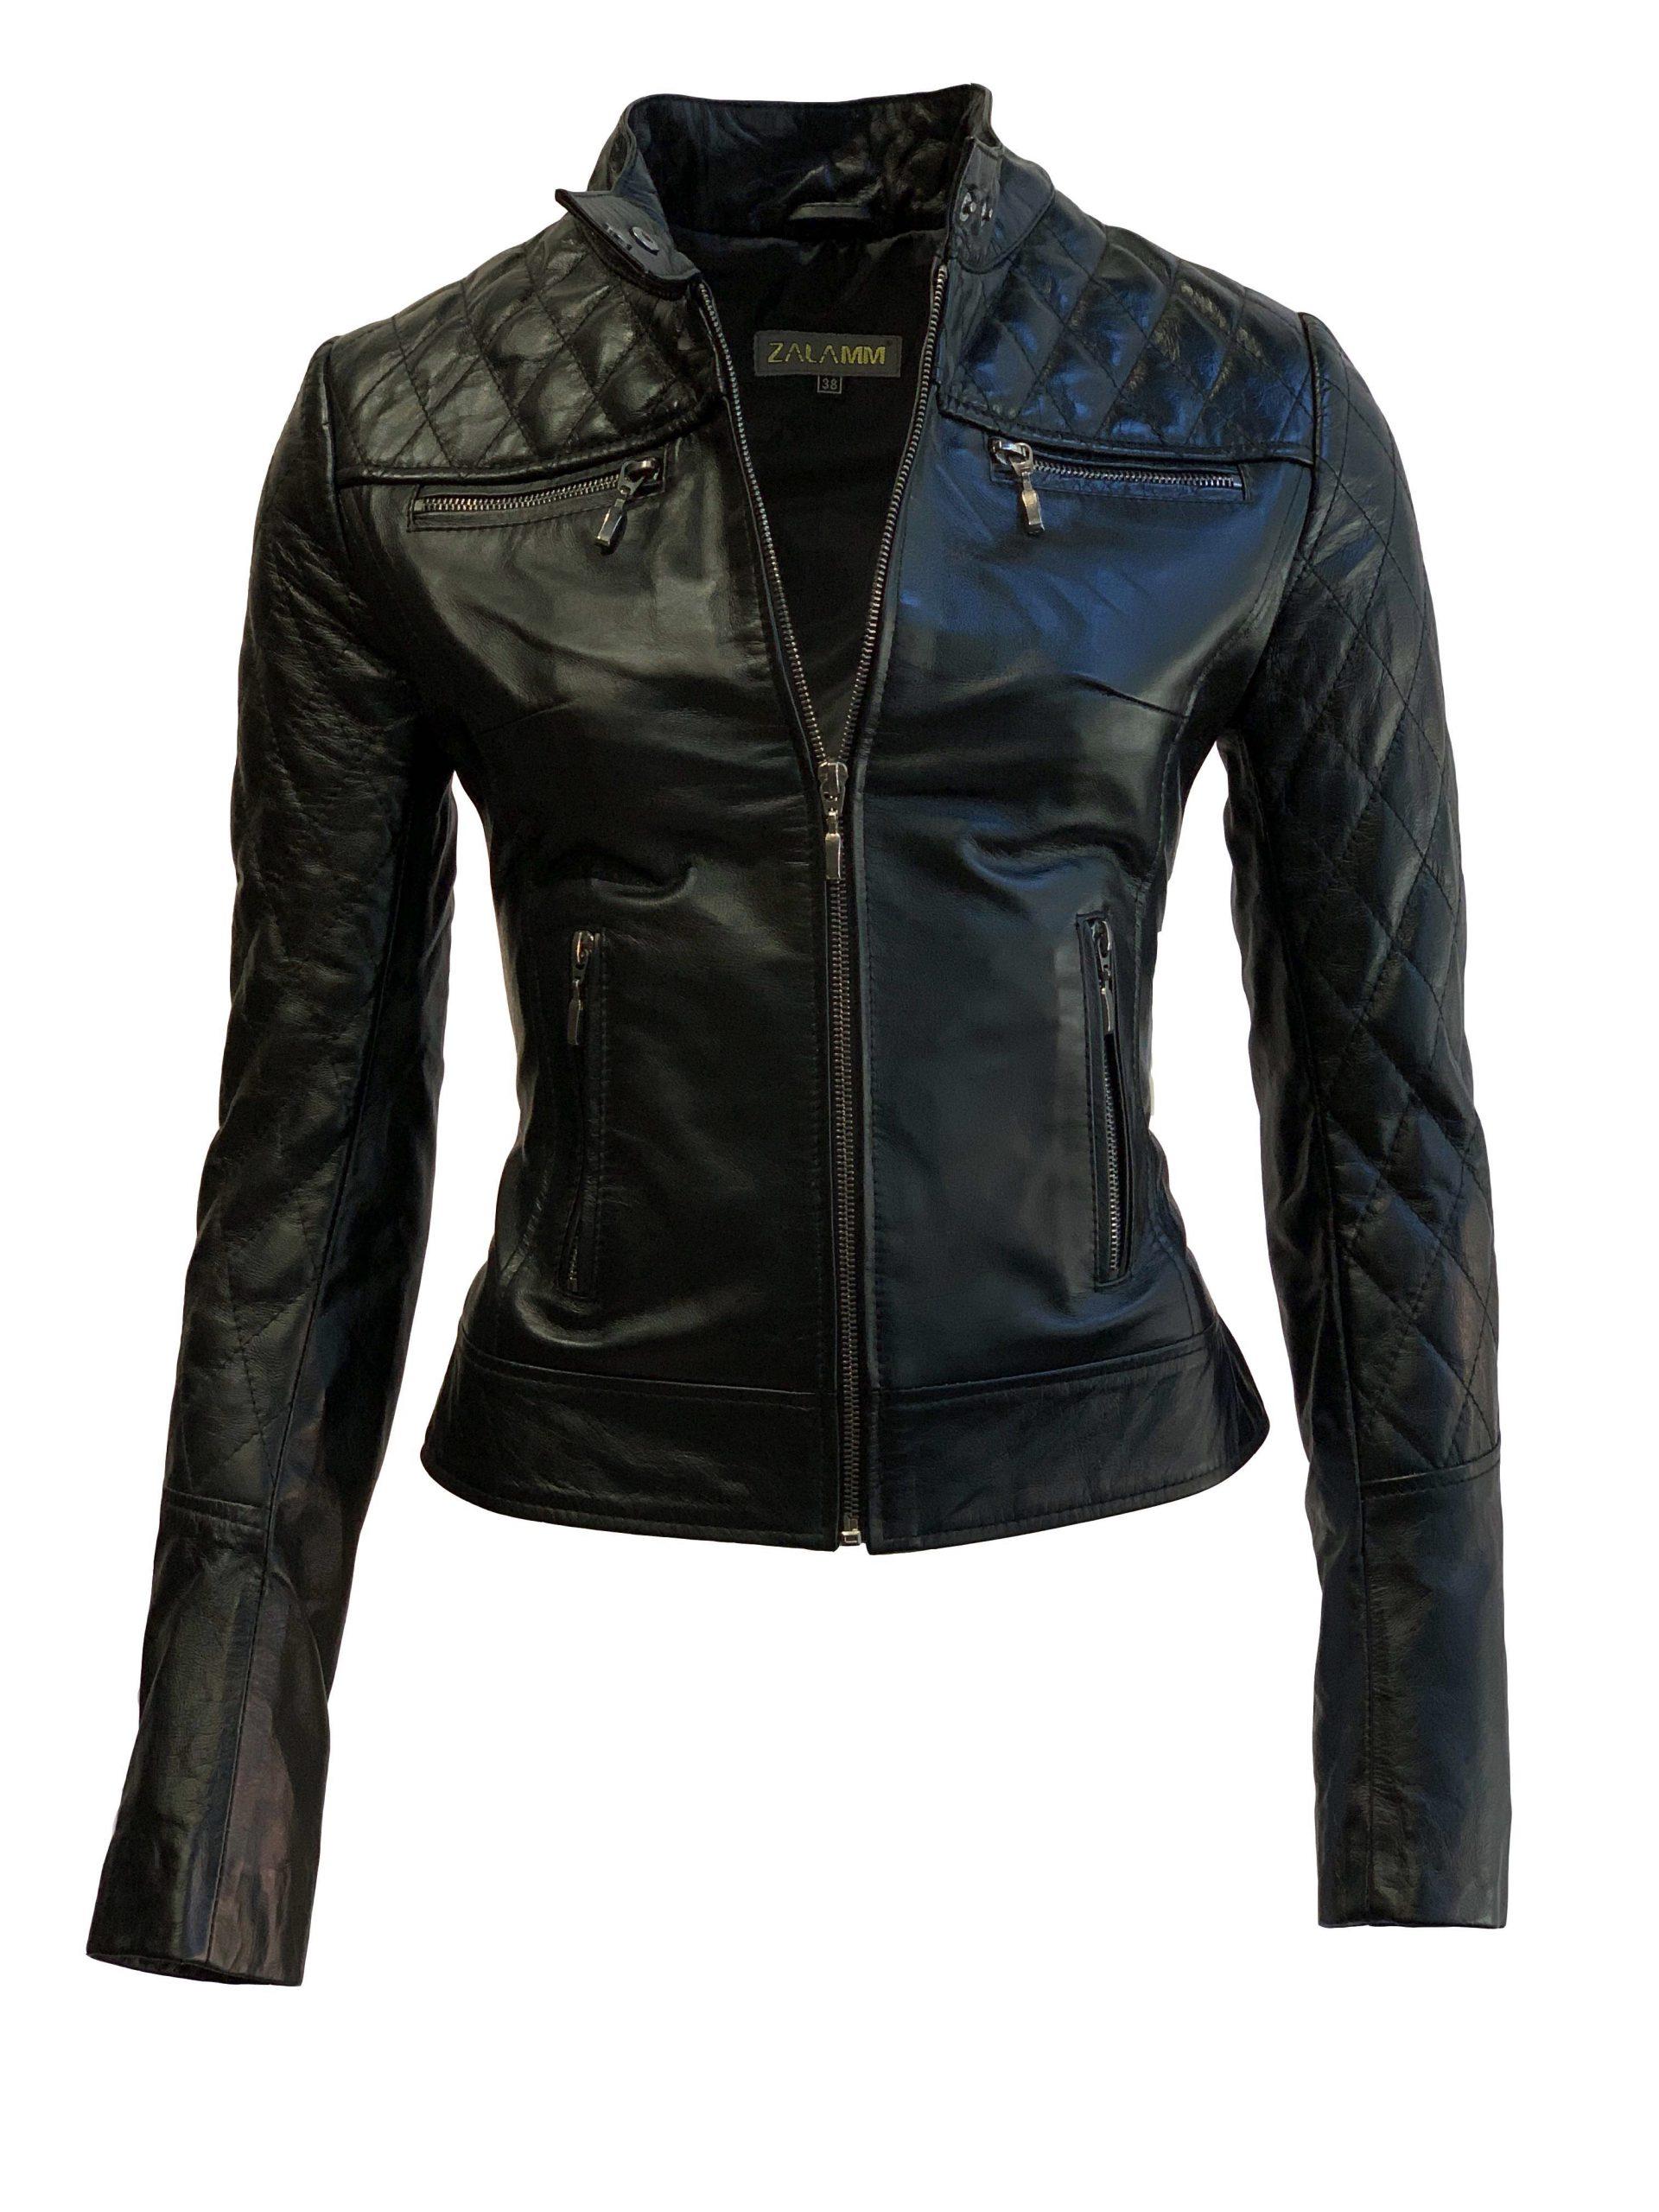 Biker leren jas dames zwart met hoge kraag 100% echt leder-damata